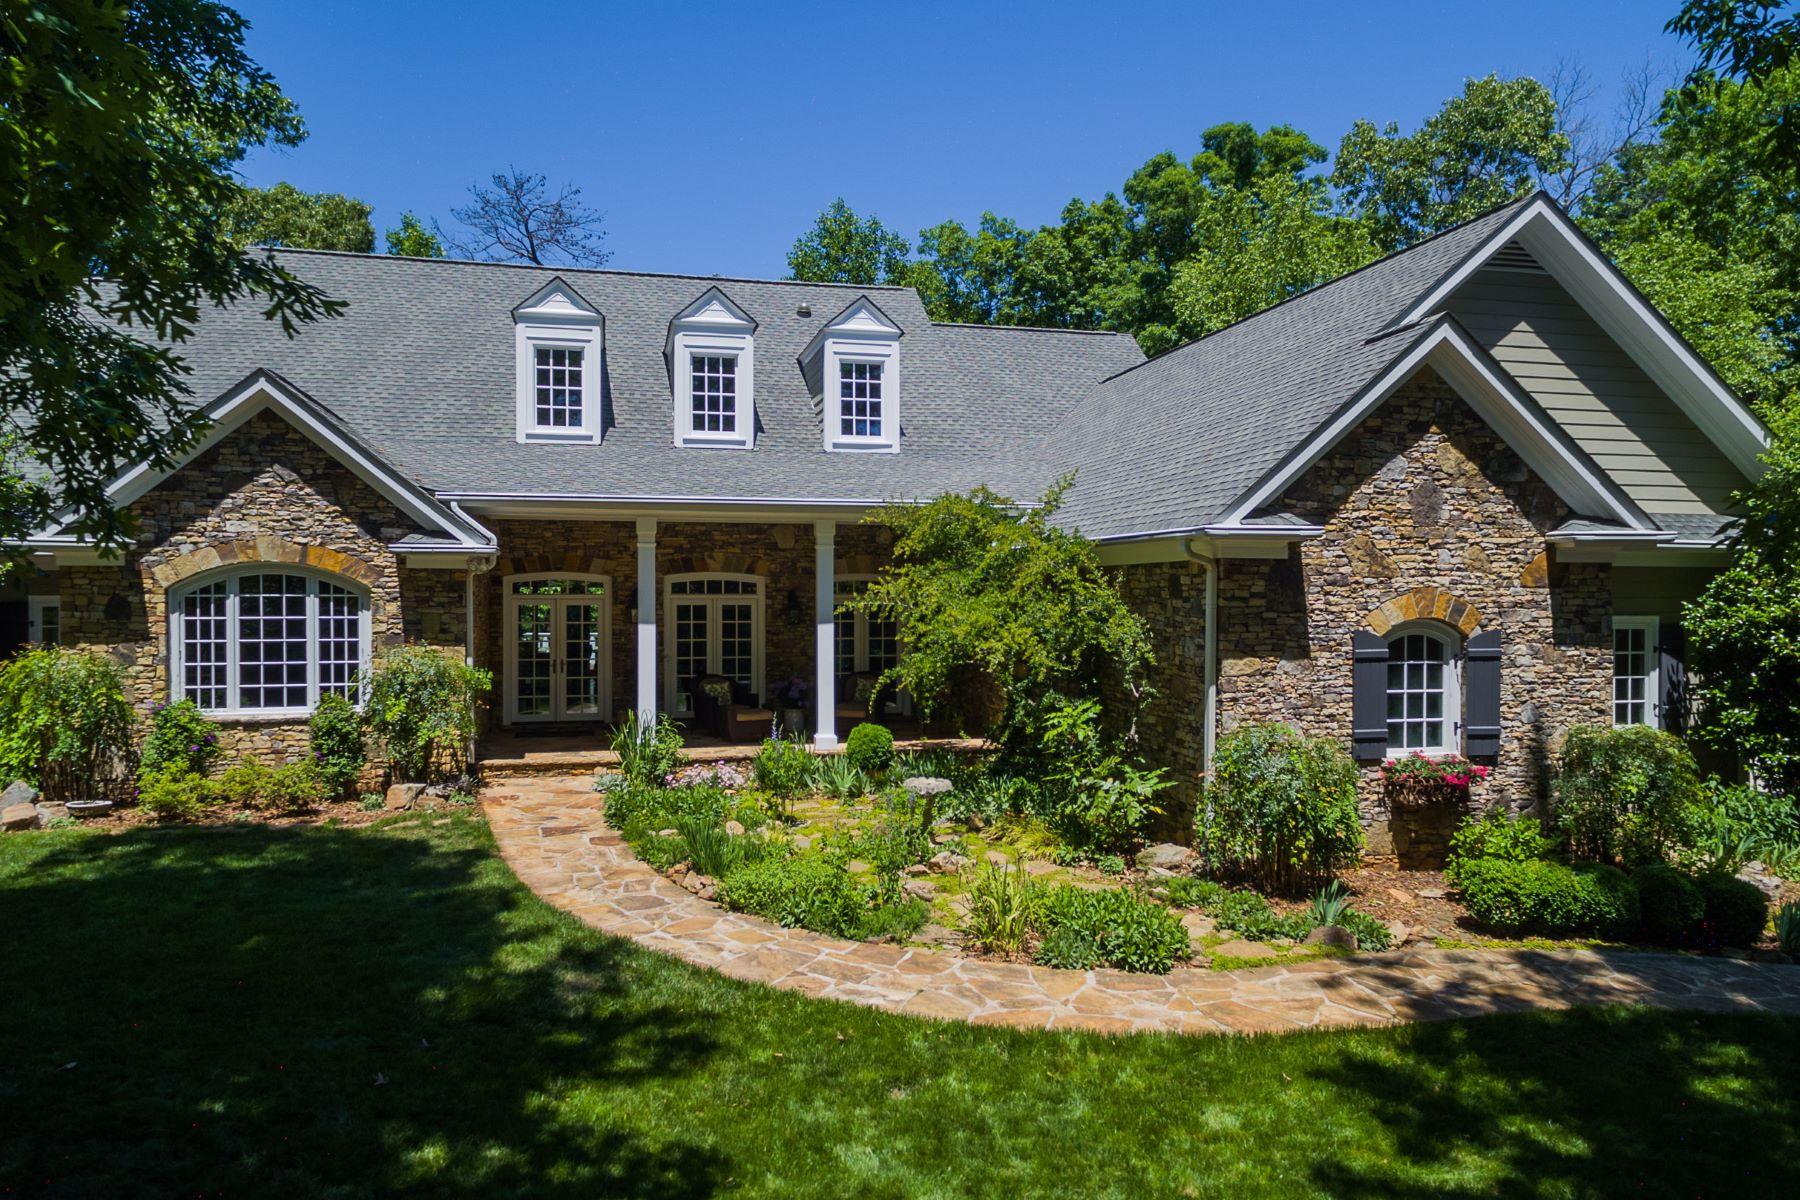 Casa Unifamiliar por un Venta en Classic French Country Home With Ridge Line Views to Jasper 1390 Summit Road Milton, Georgia, 30004 Estados Unidos